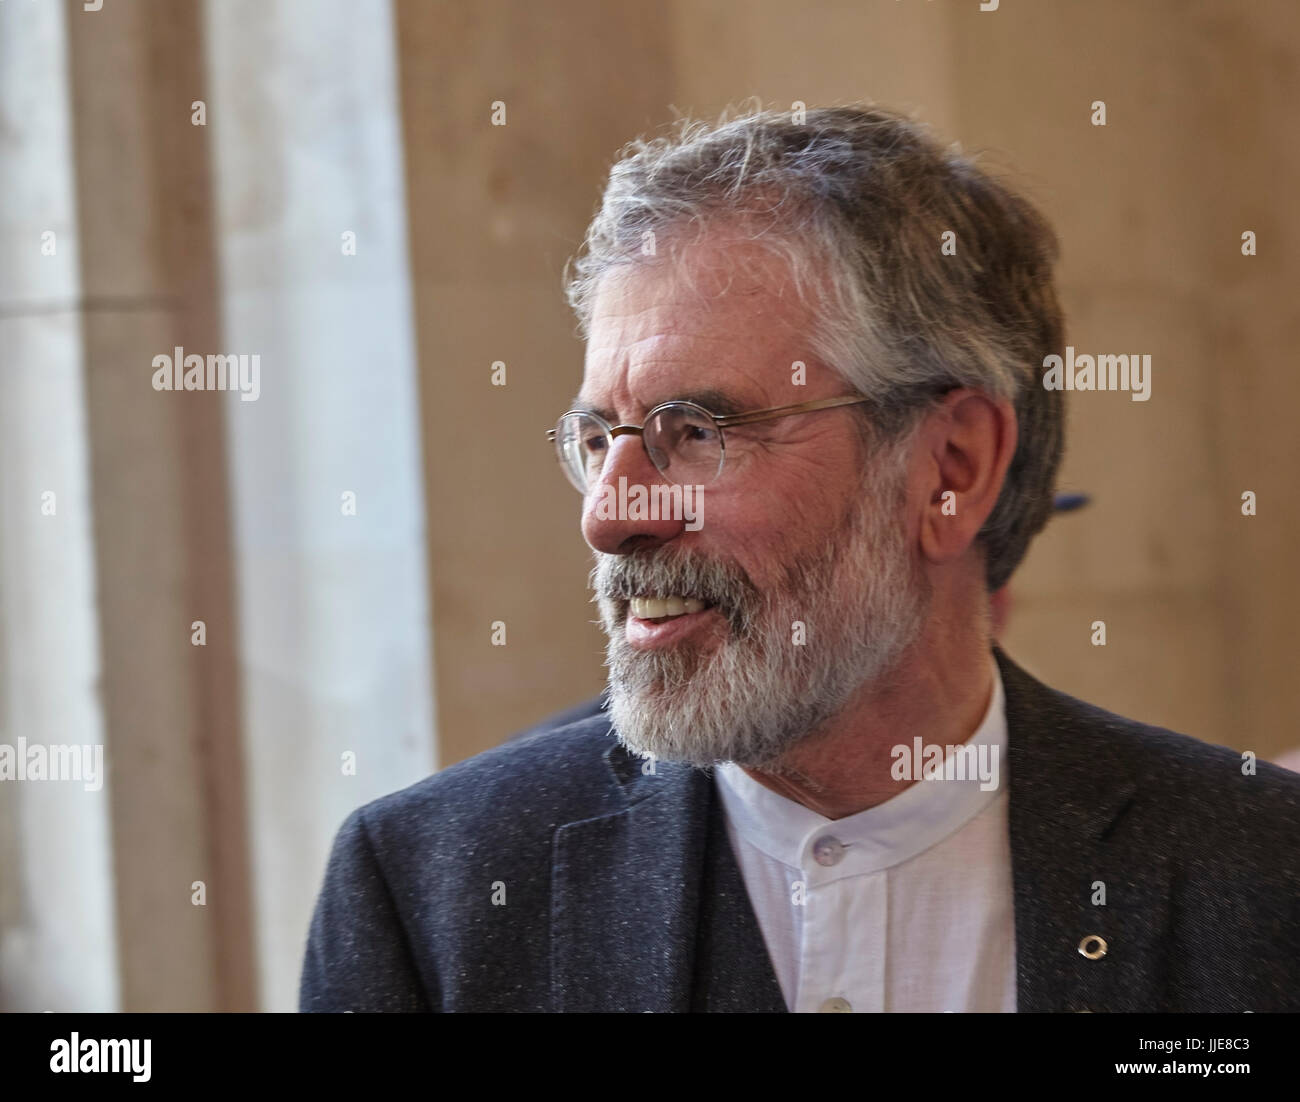 Gerry Adams, head of the Irish politcal party Sinn Fein, seen in Dublin, Ireland. - Stock Image